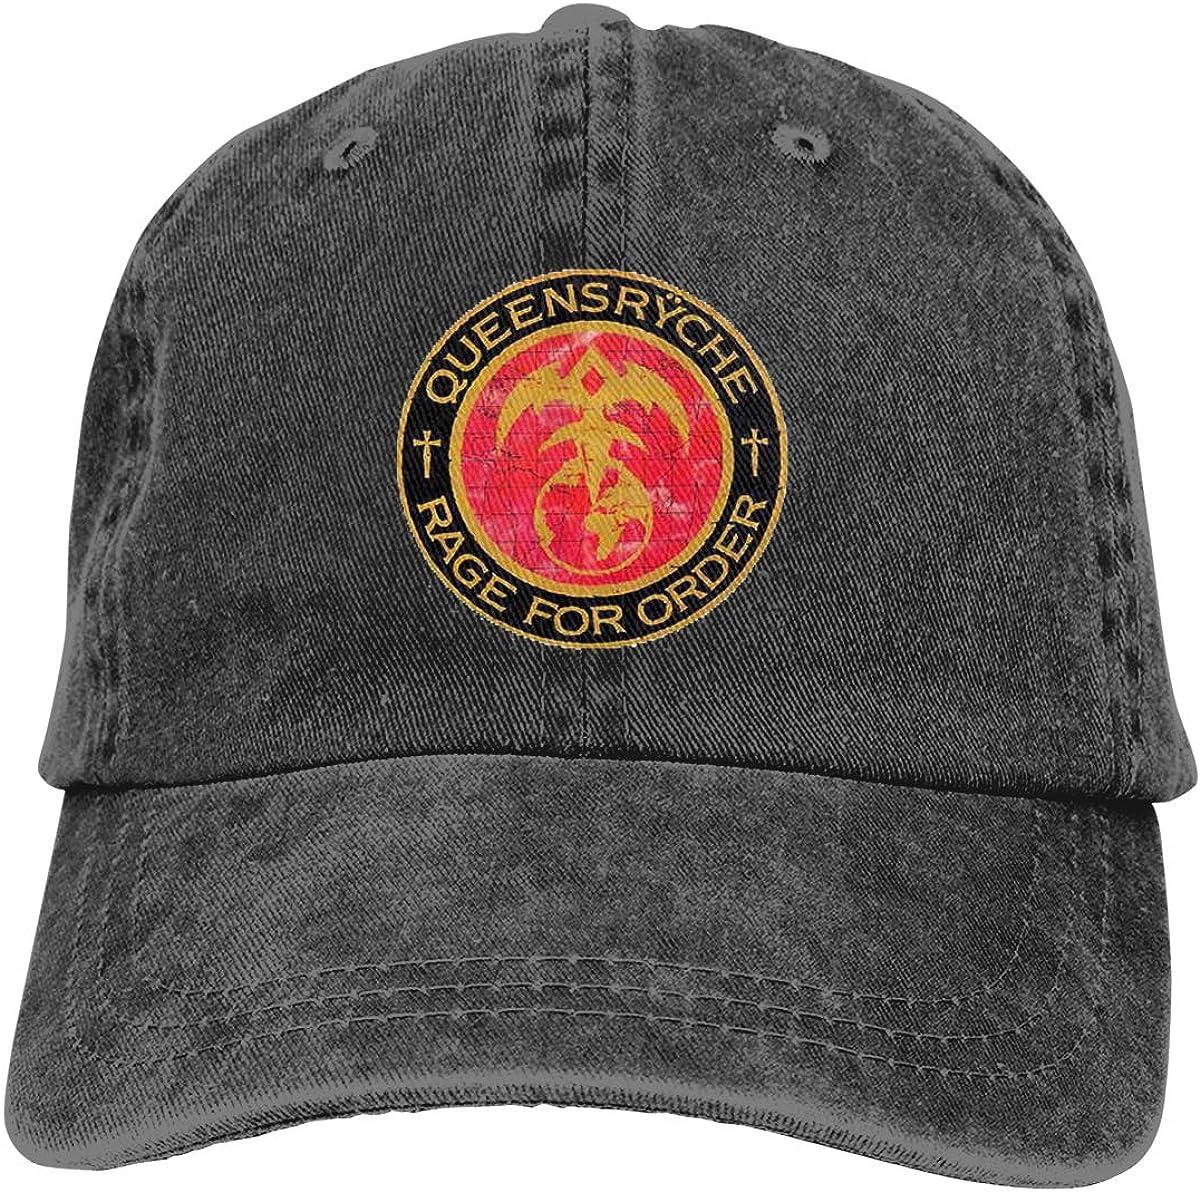 Monerla Ningpu Queensryche Rage for Order Adjustable Denim Hats